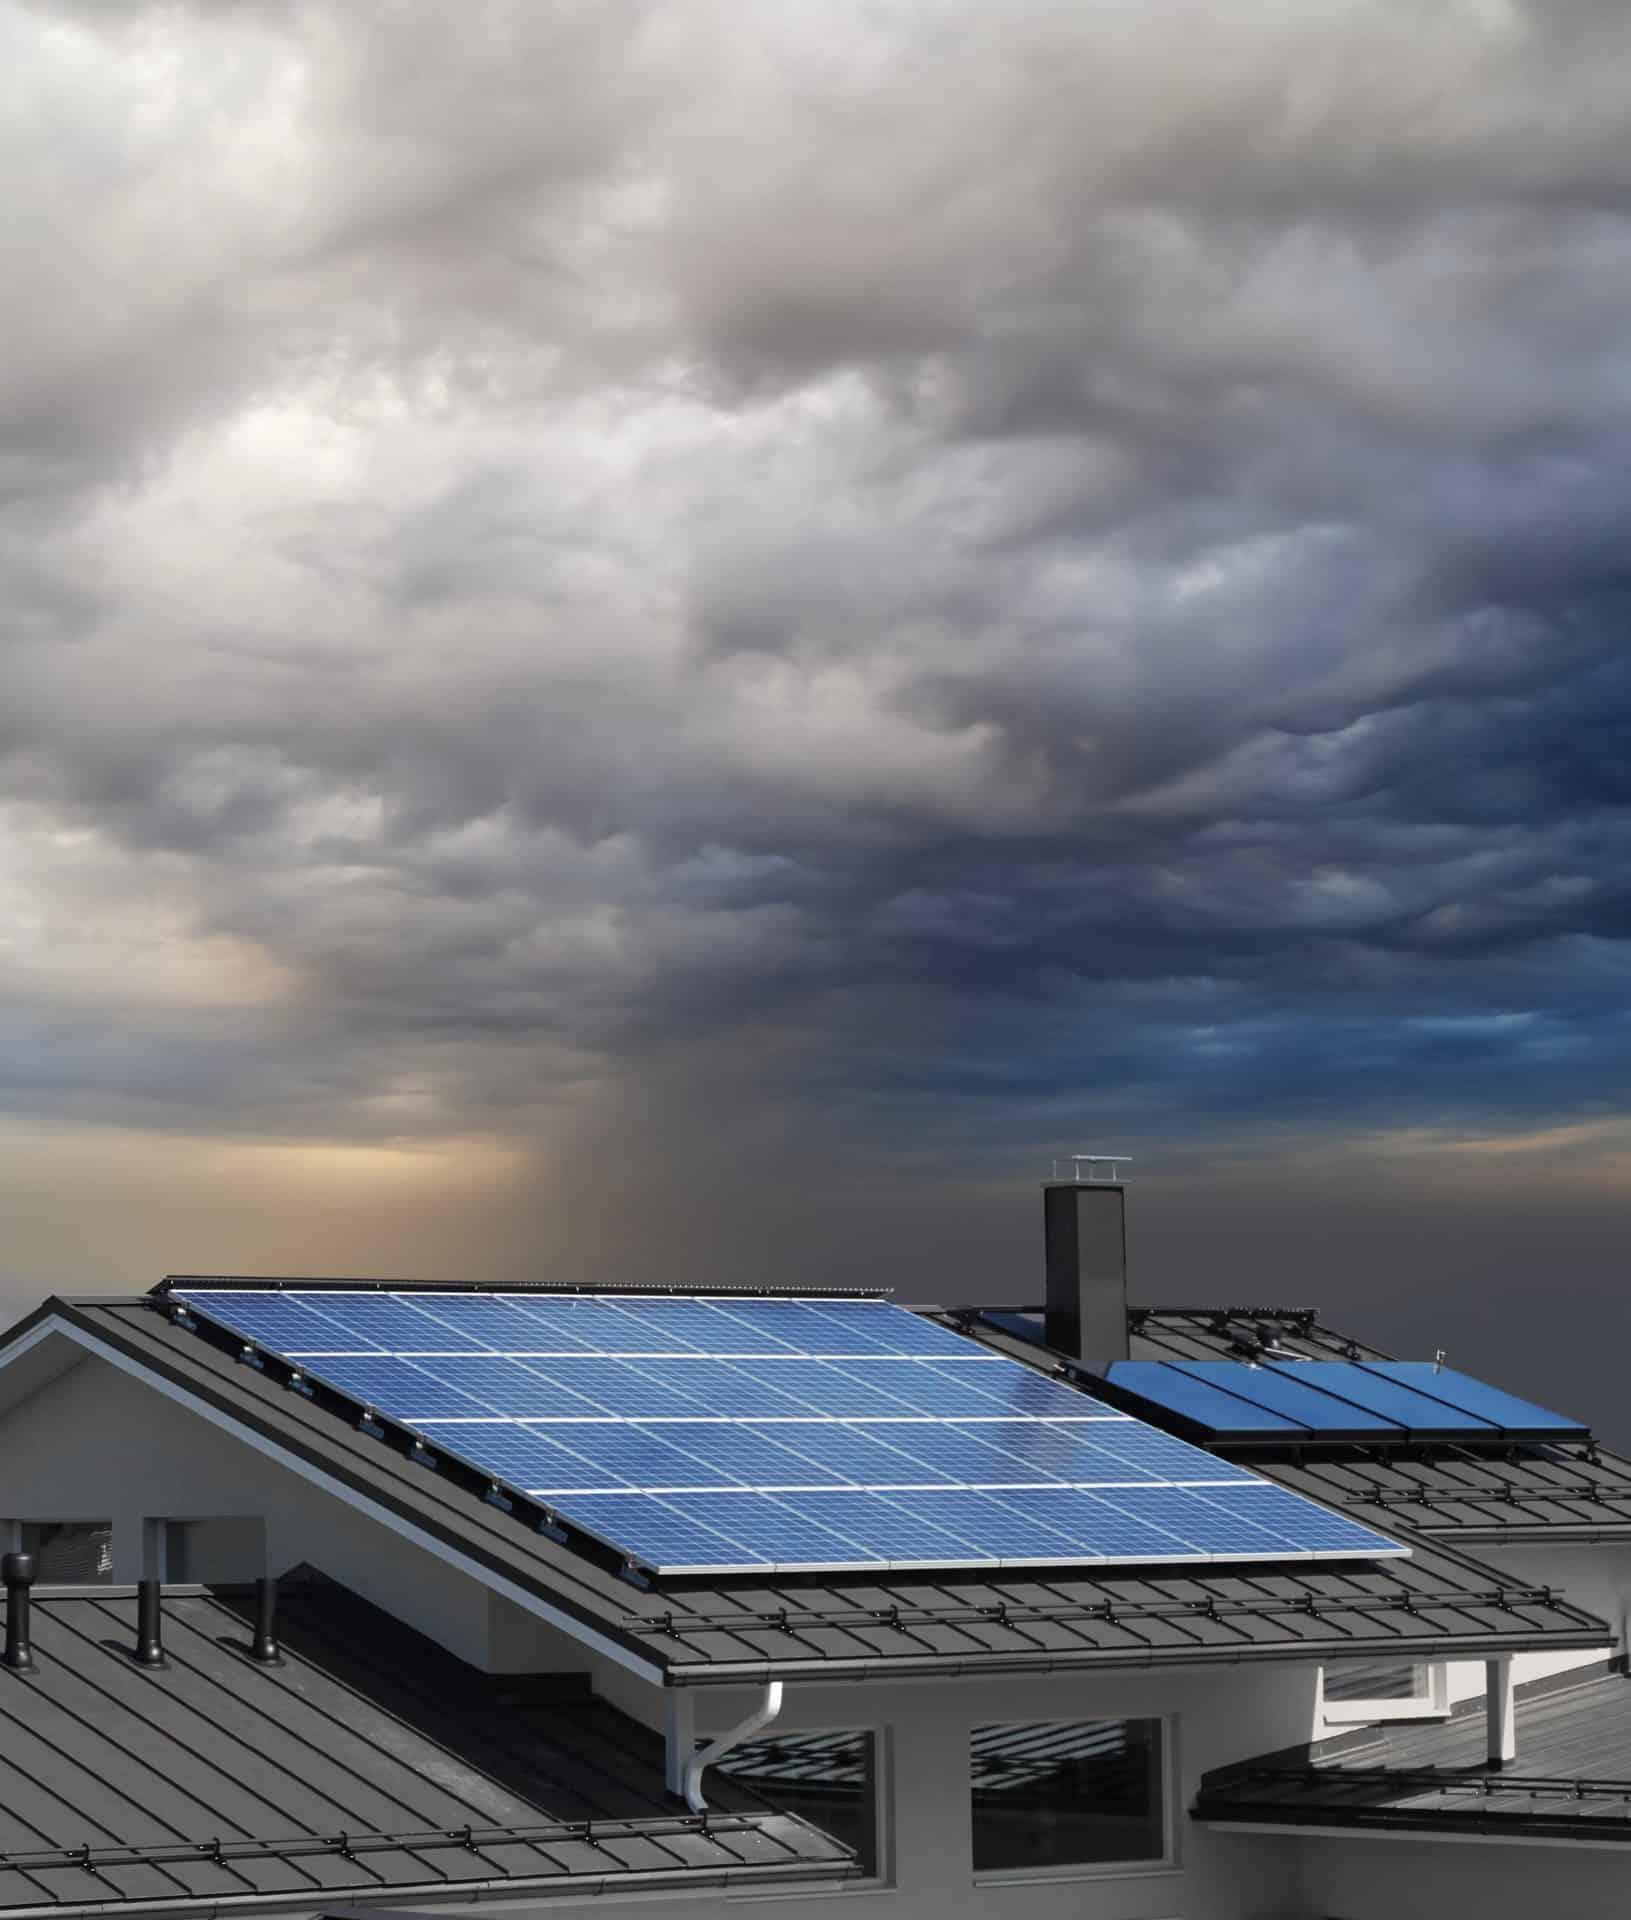 solar power not sunny